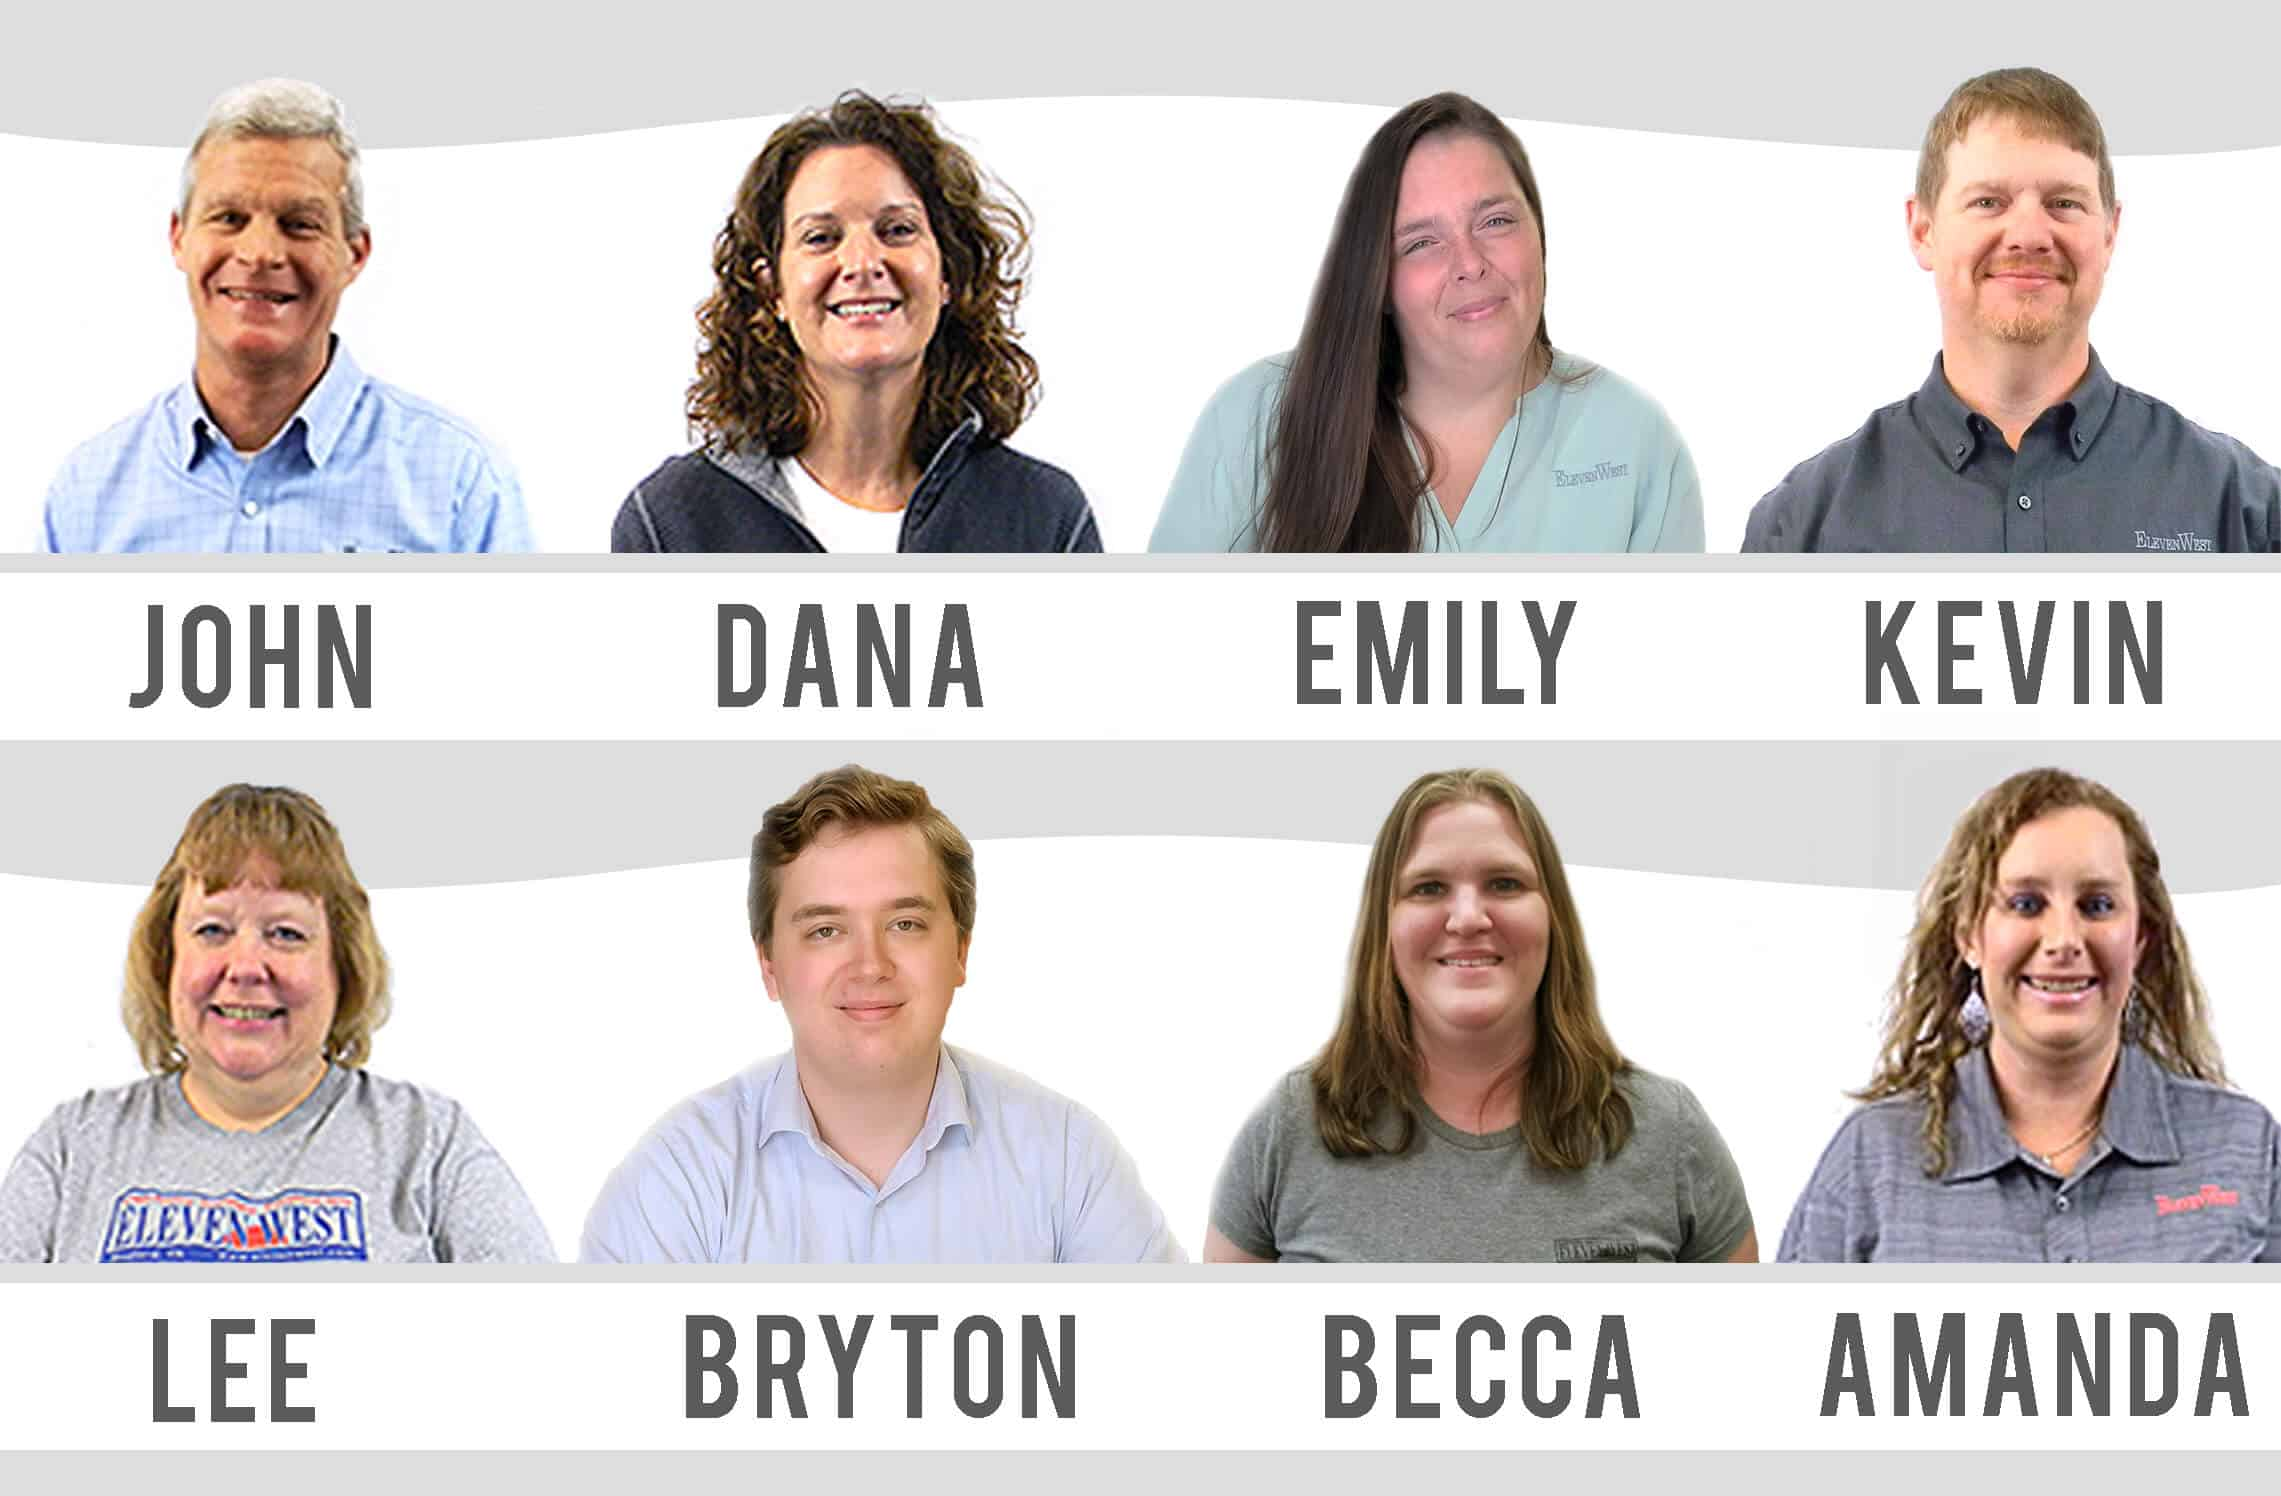 Pic of Elelevenwest team members